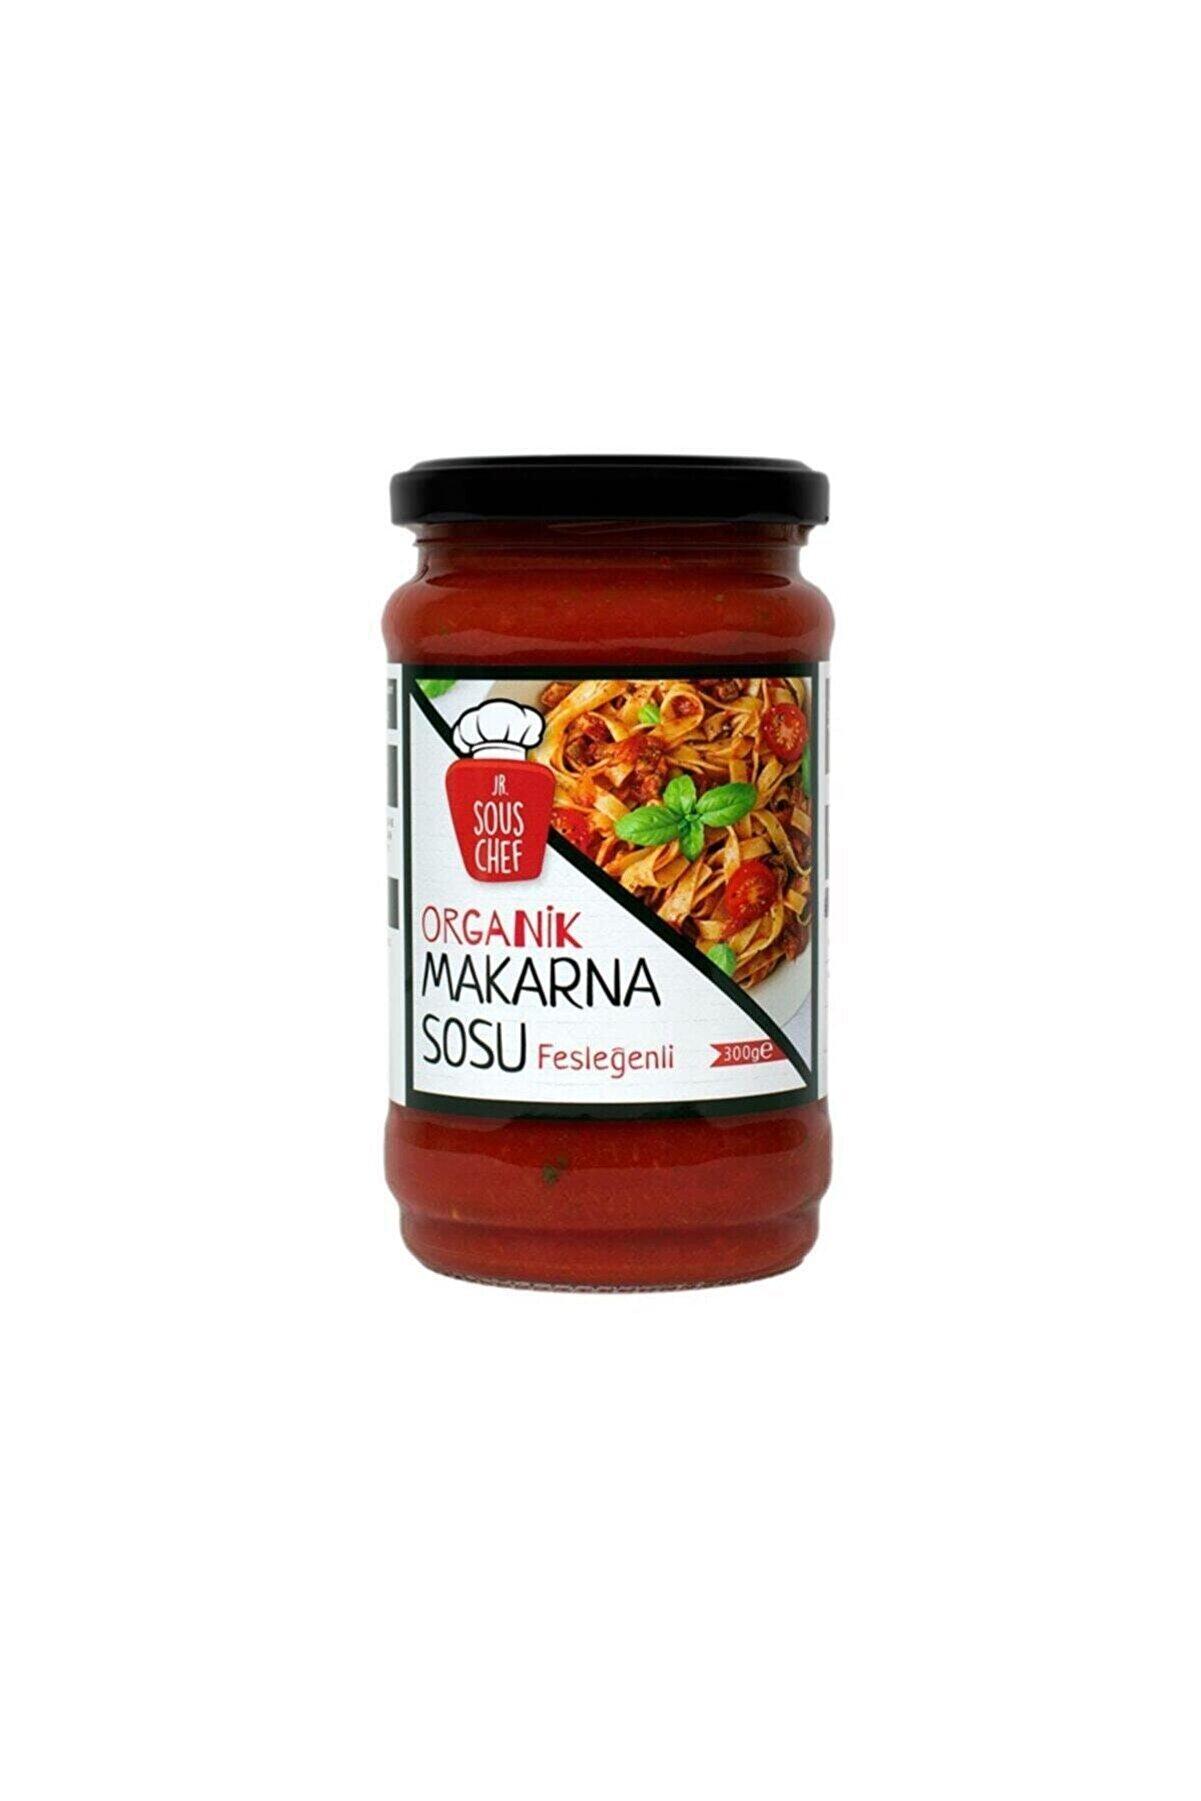 Jr.Sous Chef Organik Makarna Sosu Fesleğenli 300 g